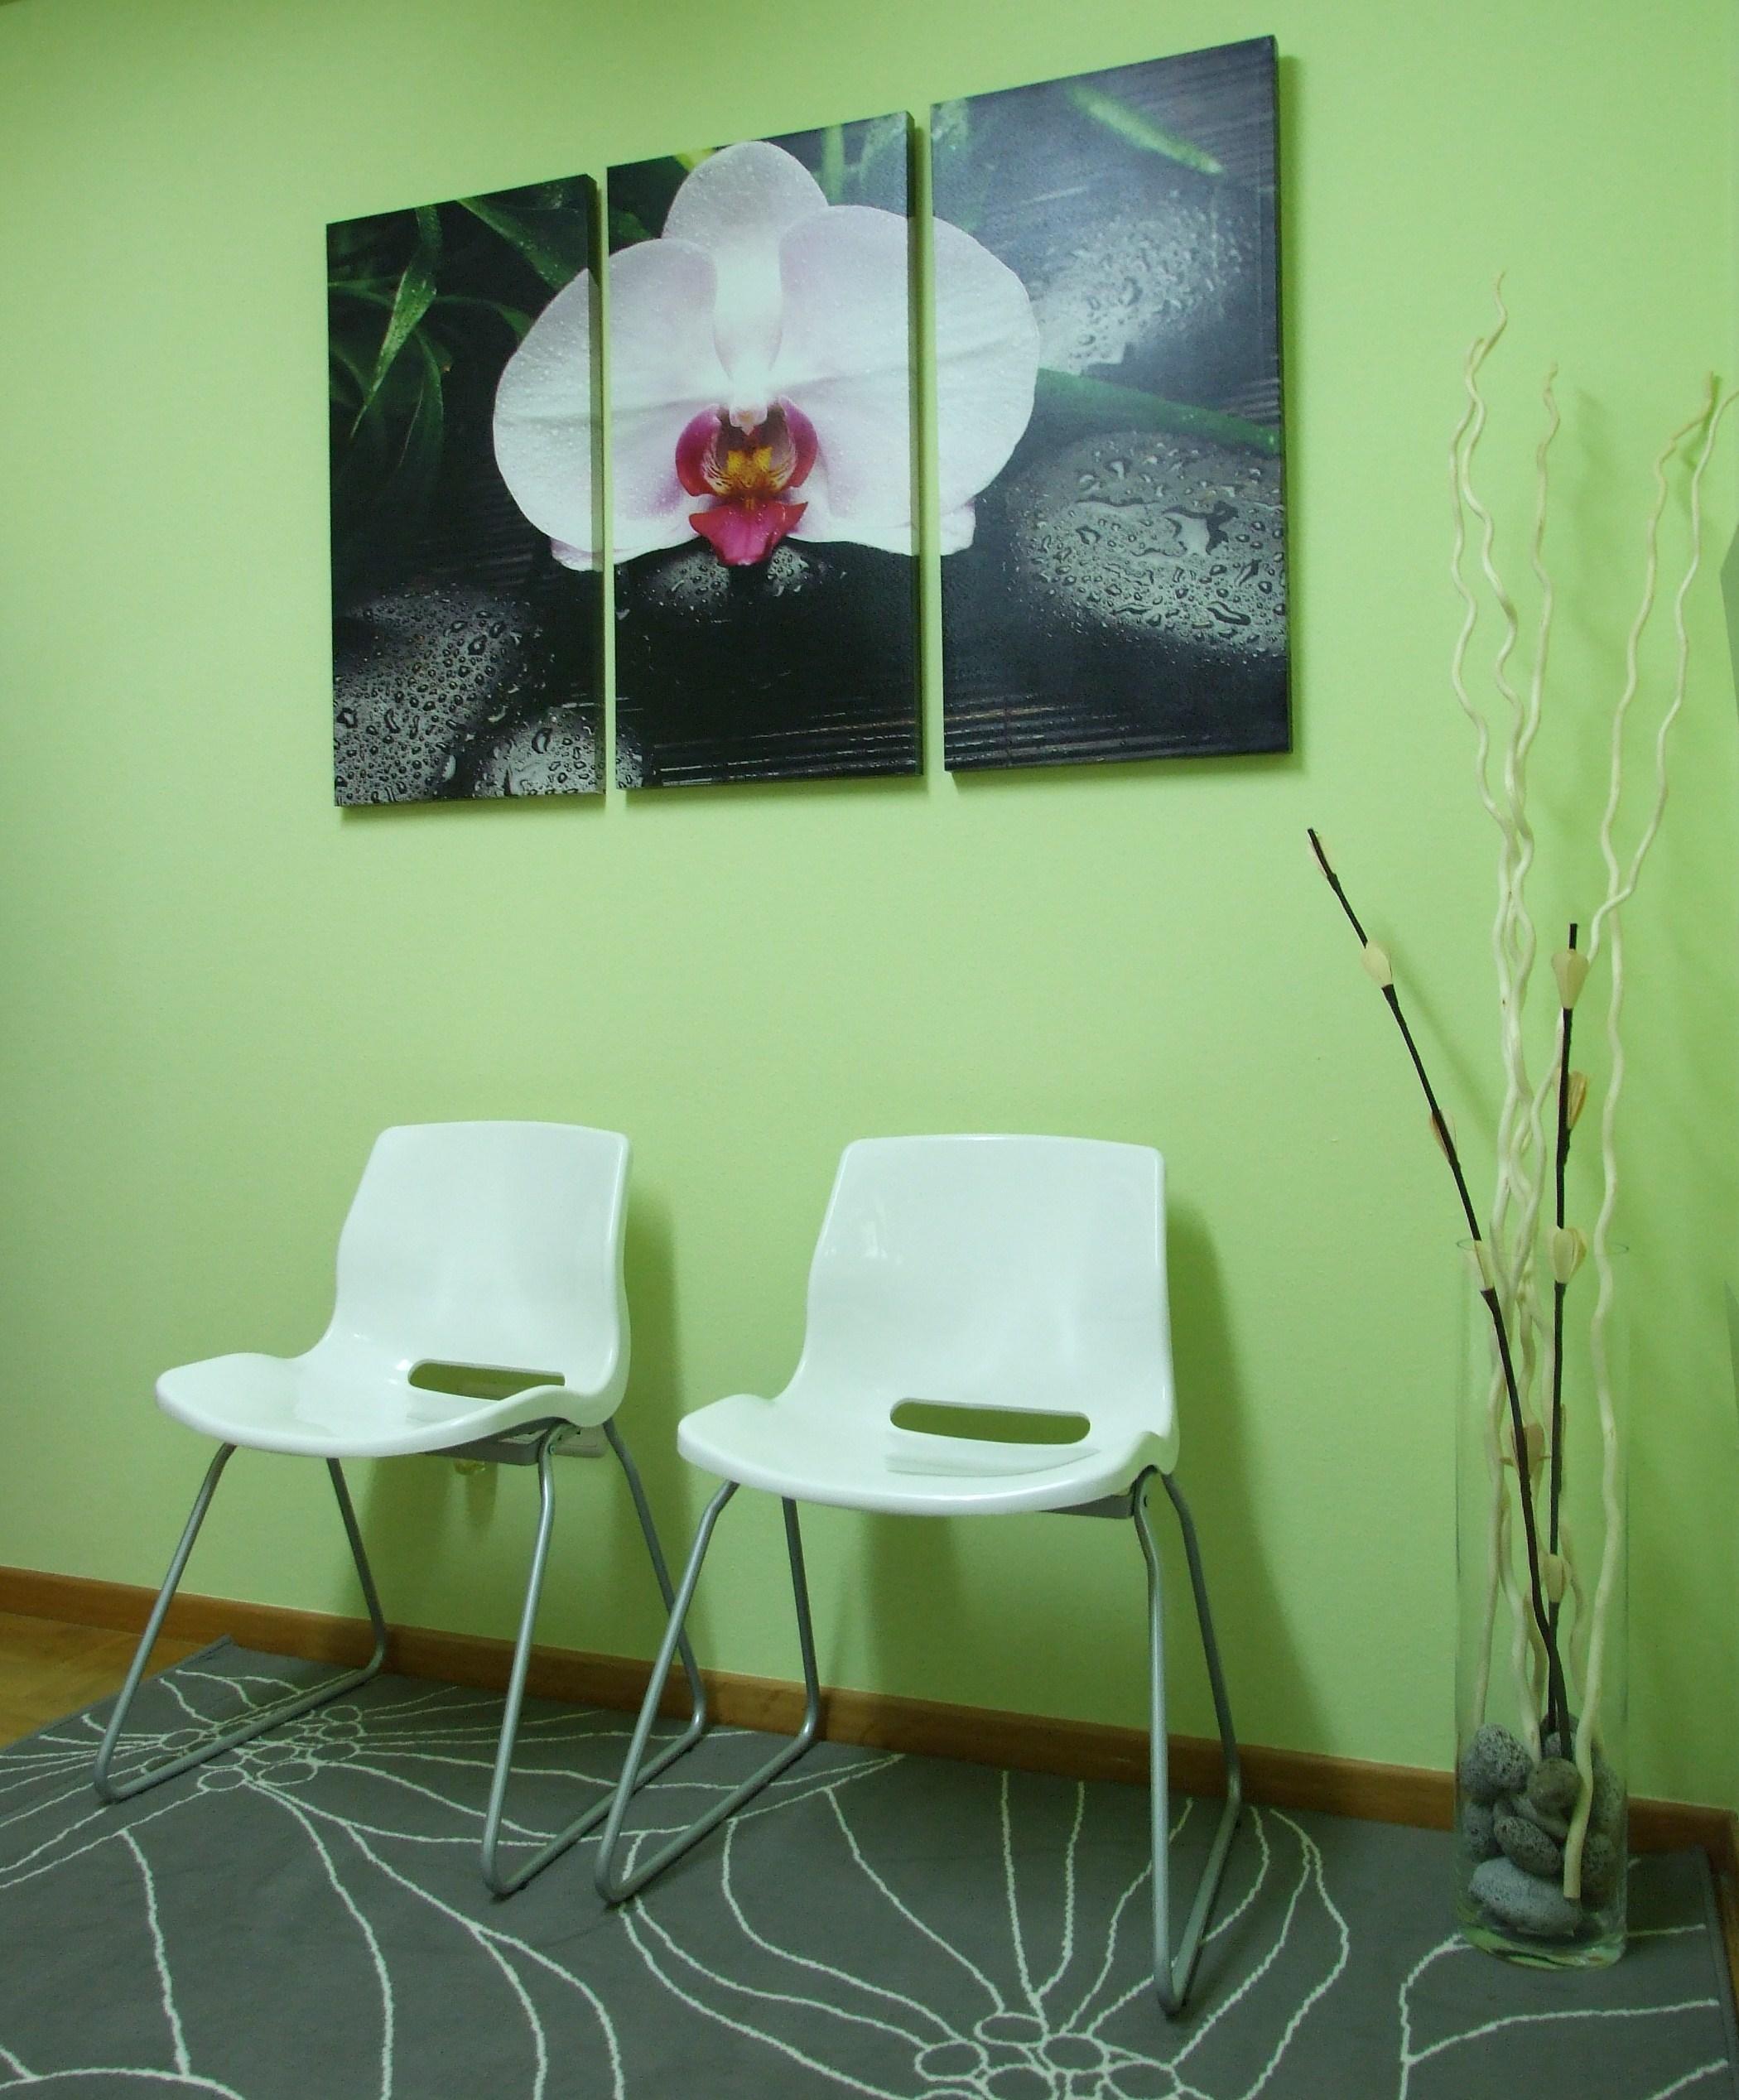 Sala de espera Psicólogos Avilés (Asturias)